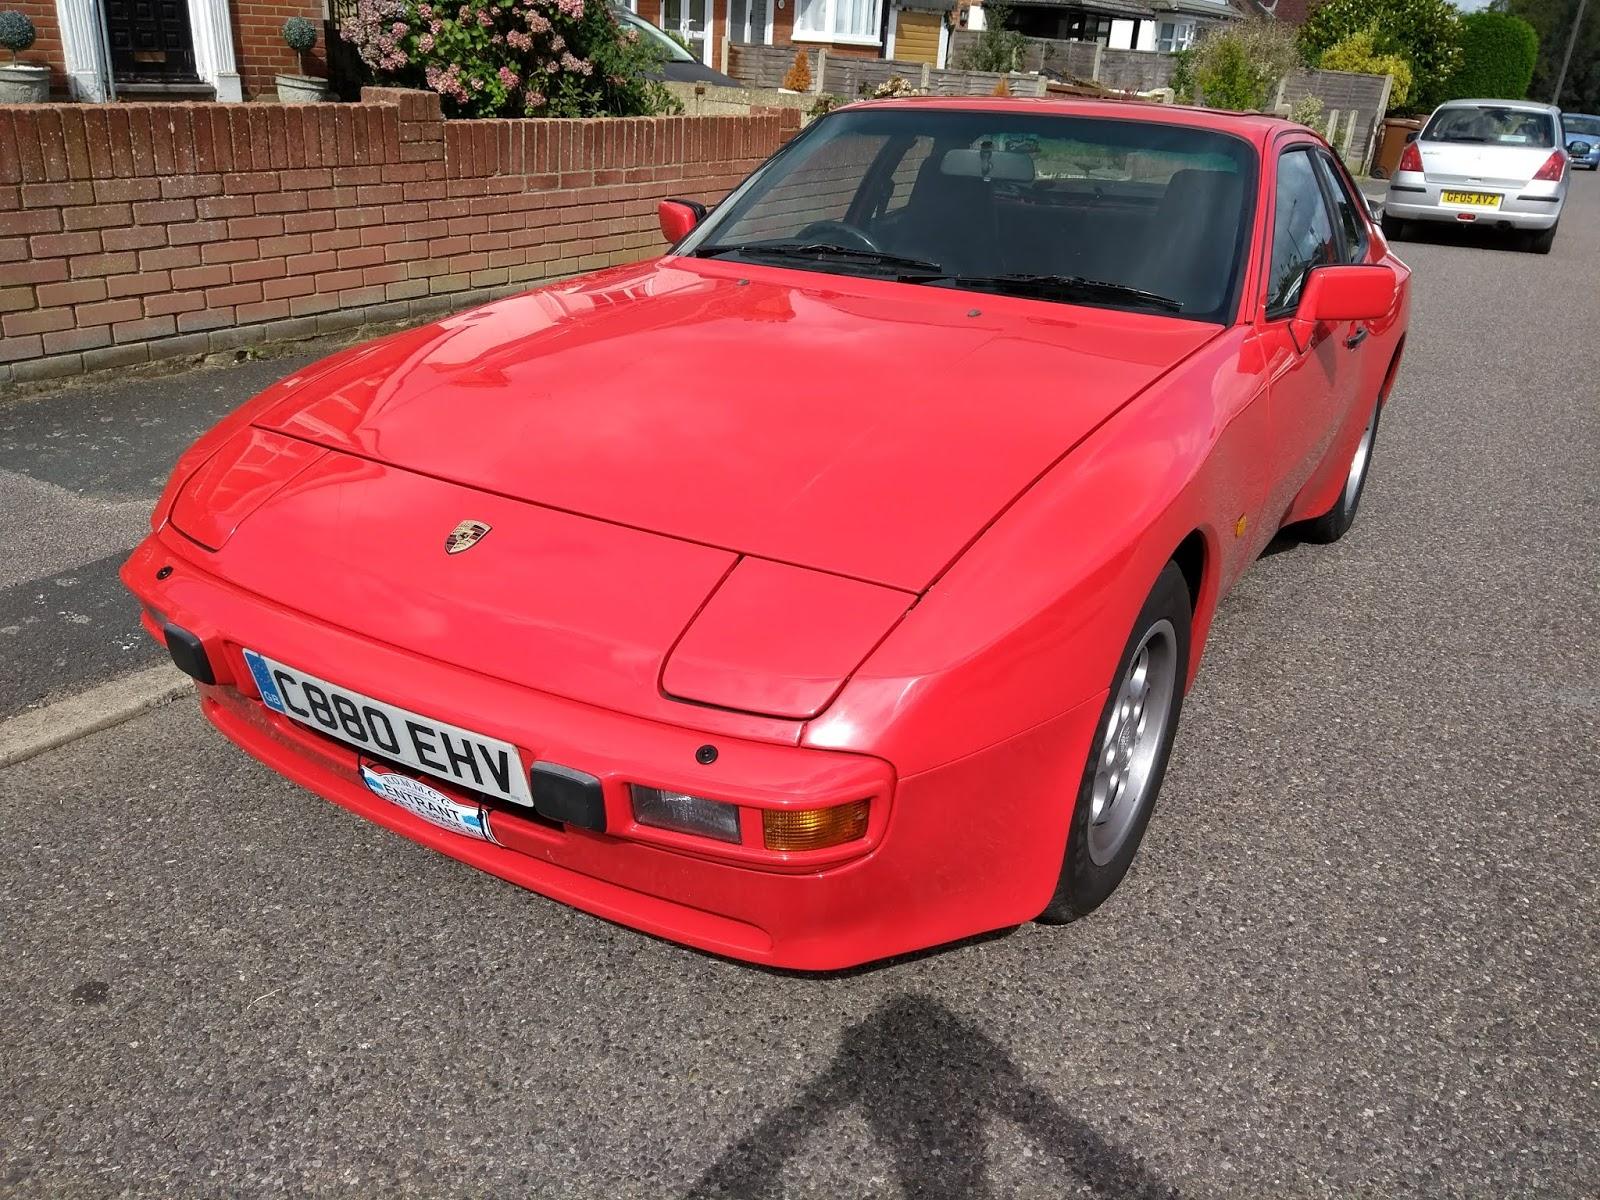 7e838f990fce Diary of porsche owner feedback and reviews of running jpg 1600x1200 Porsche  944 924 car classic